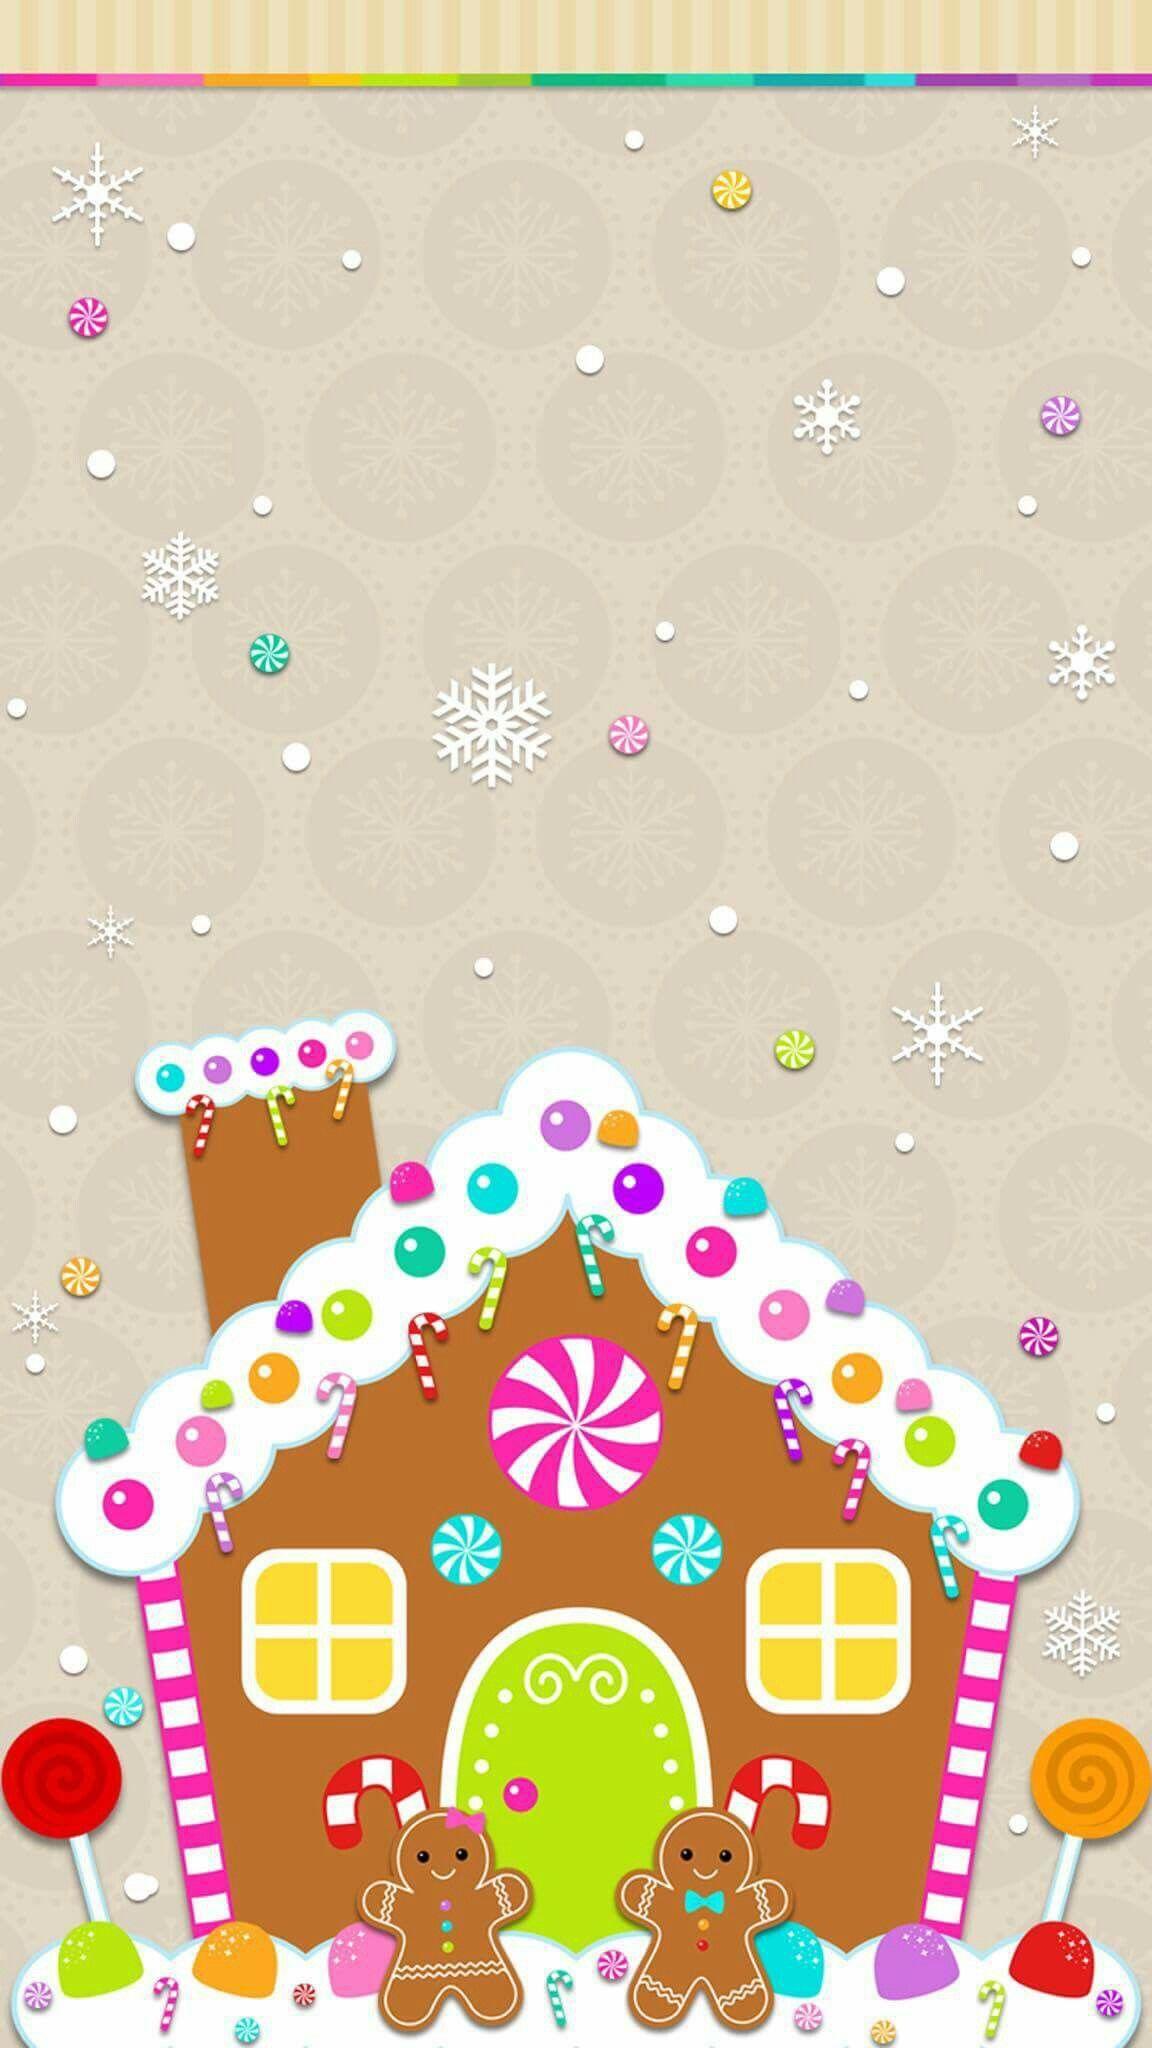 Kawaii Christmas Iphone Wallpaper   Reviewwalls.co